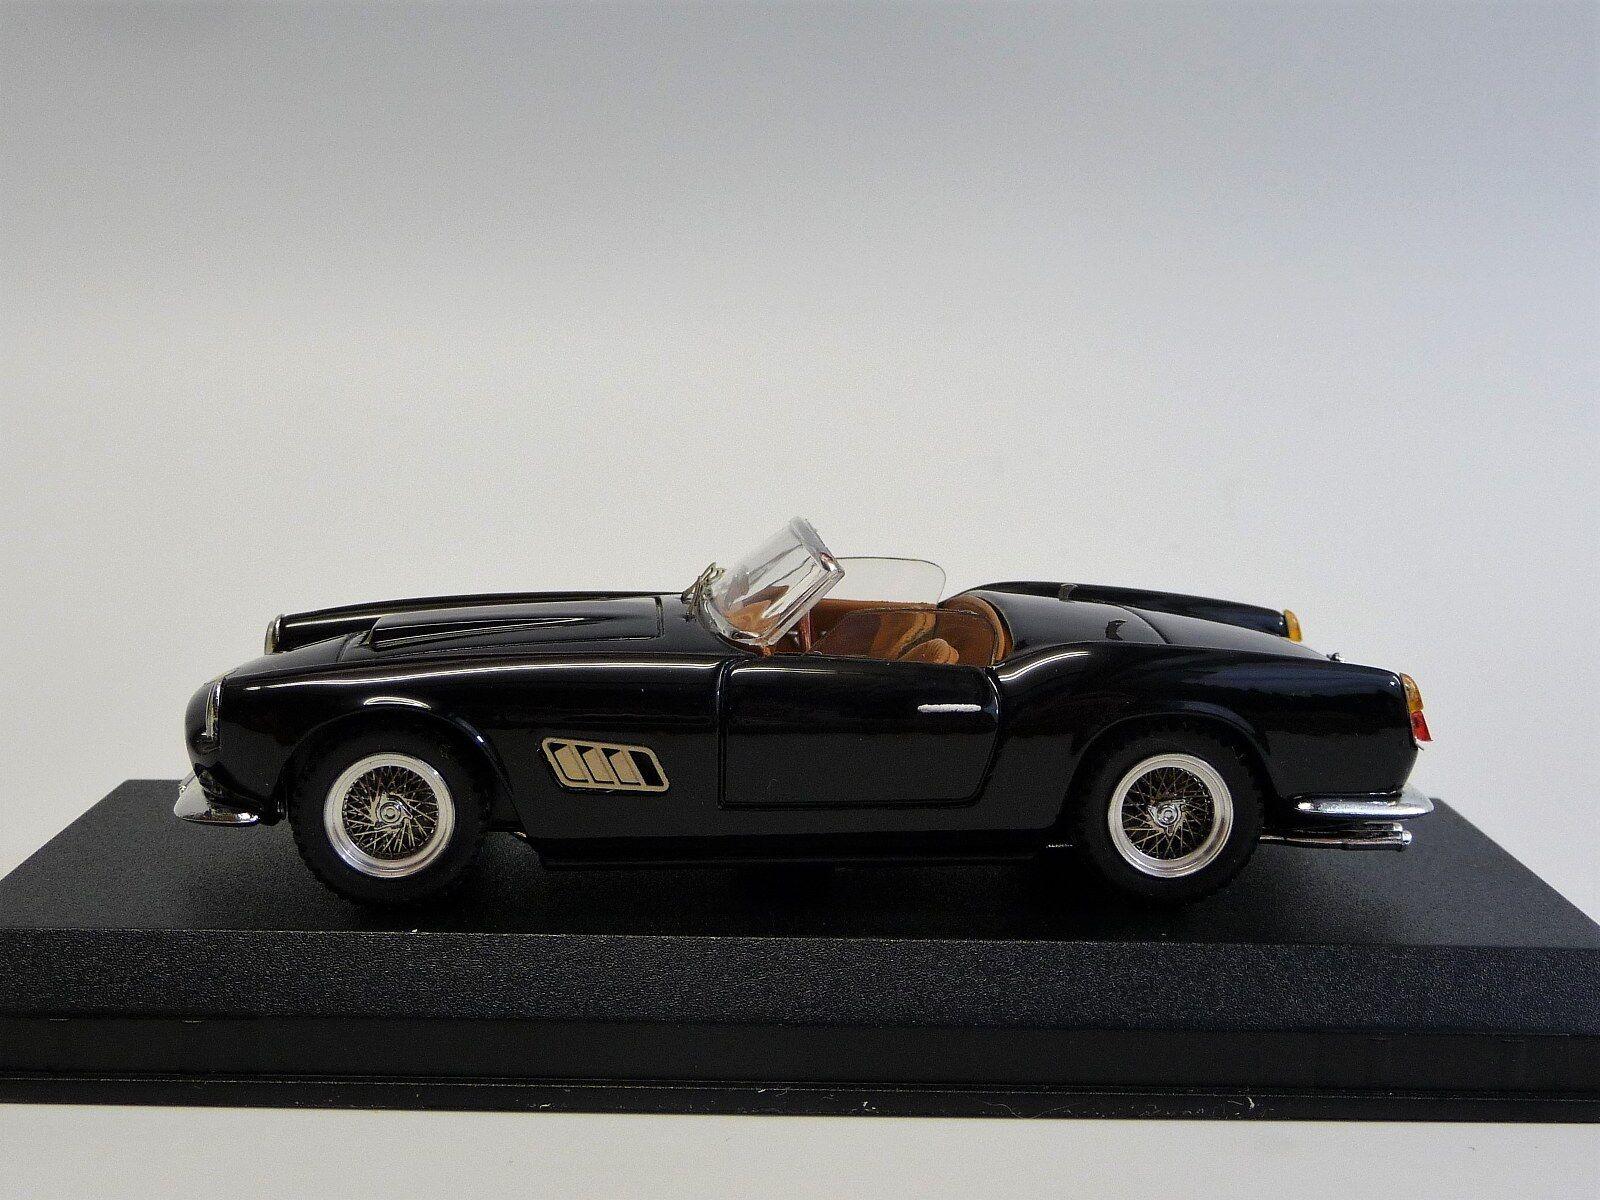 Ferrari 250 CALIFORNIIA STRADALE Noir Type Type Type Model art071 NEUF dans neuf dans sa boîte 1 43 09aef0